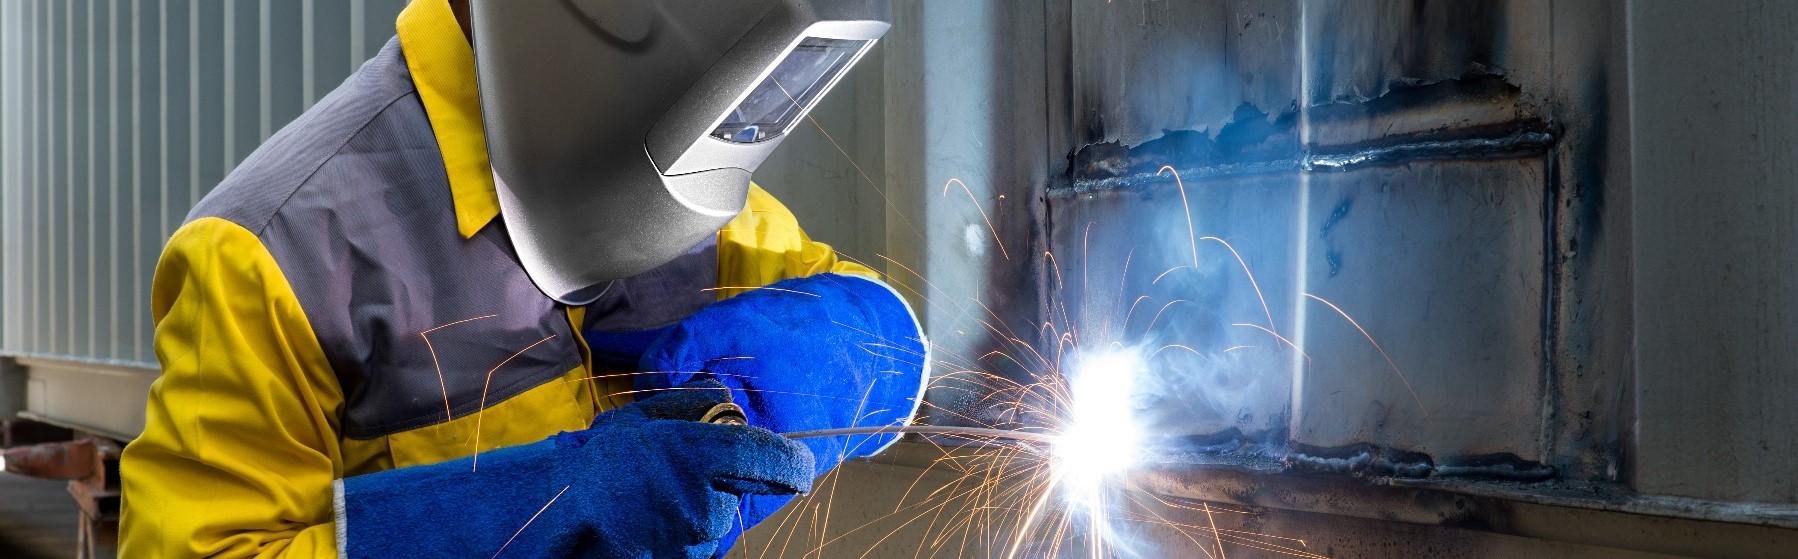 welding-technician-safety-alliance